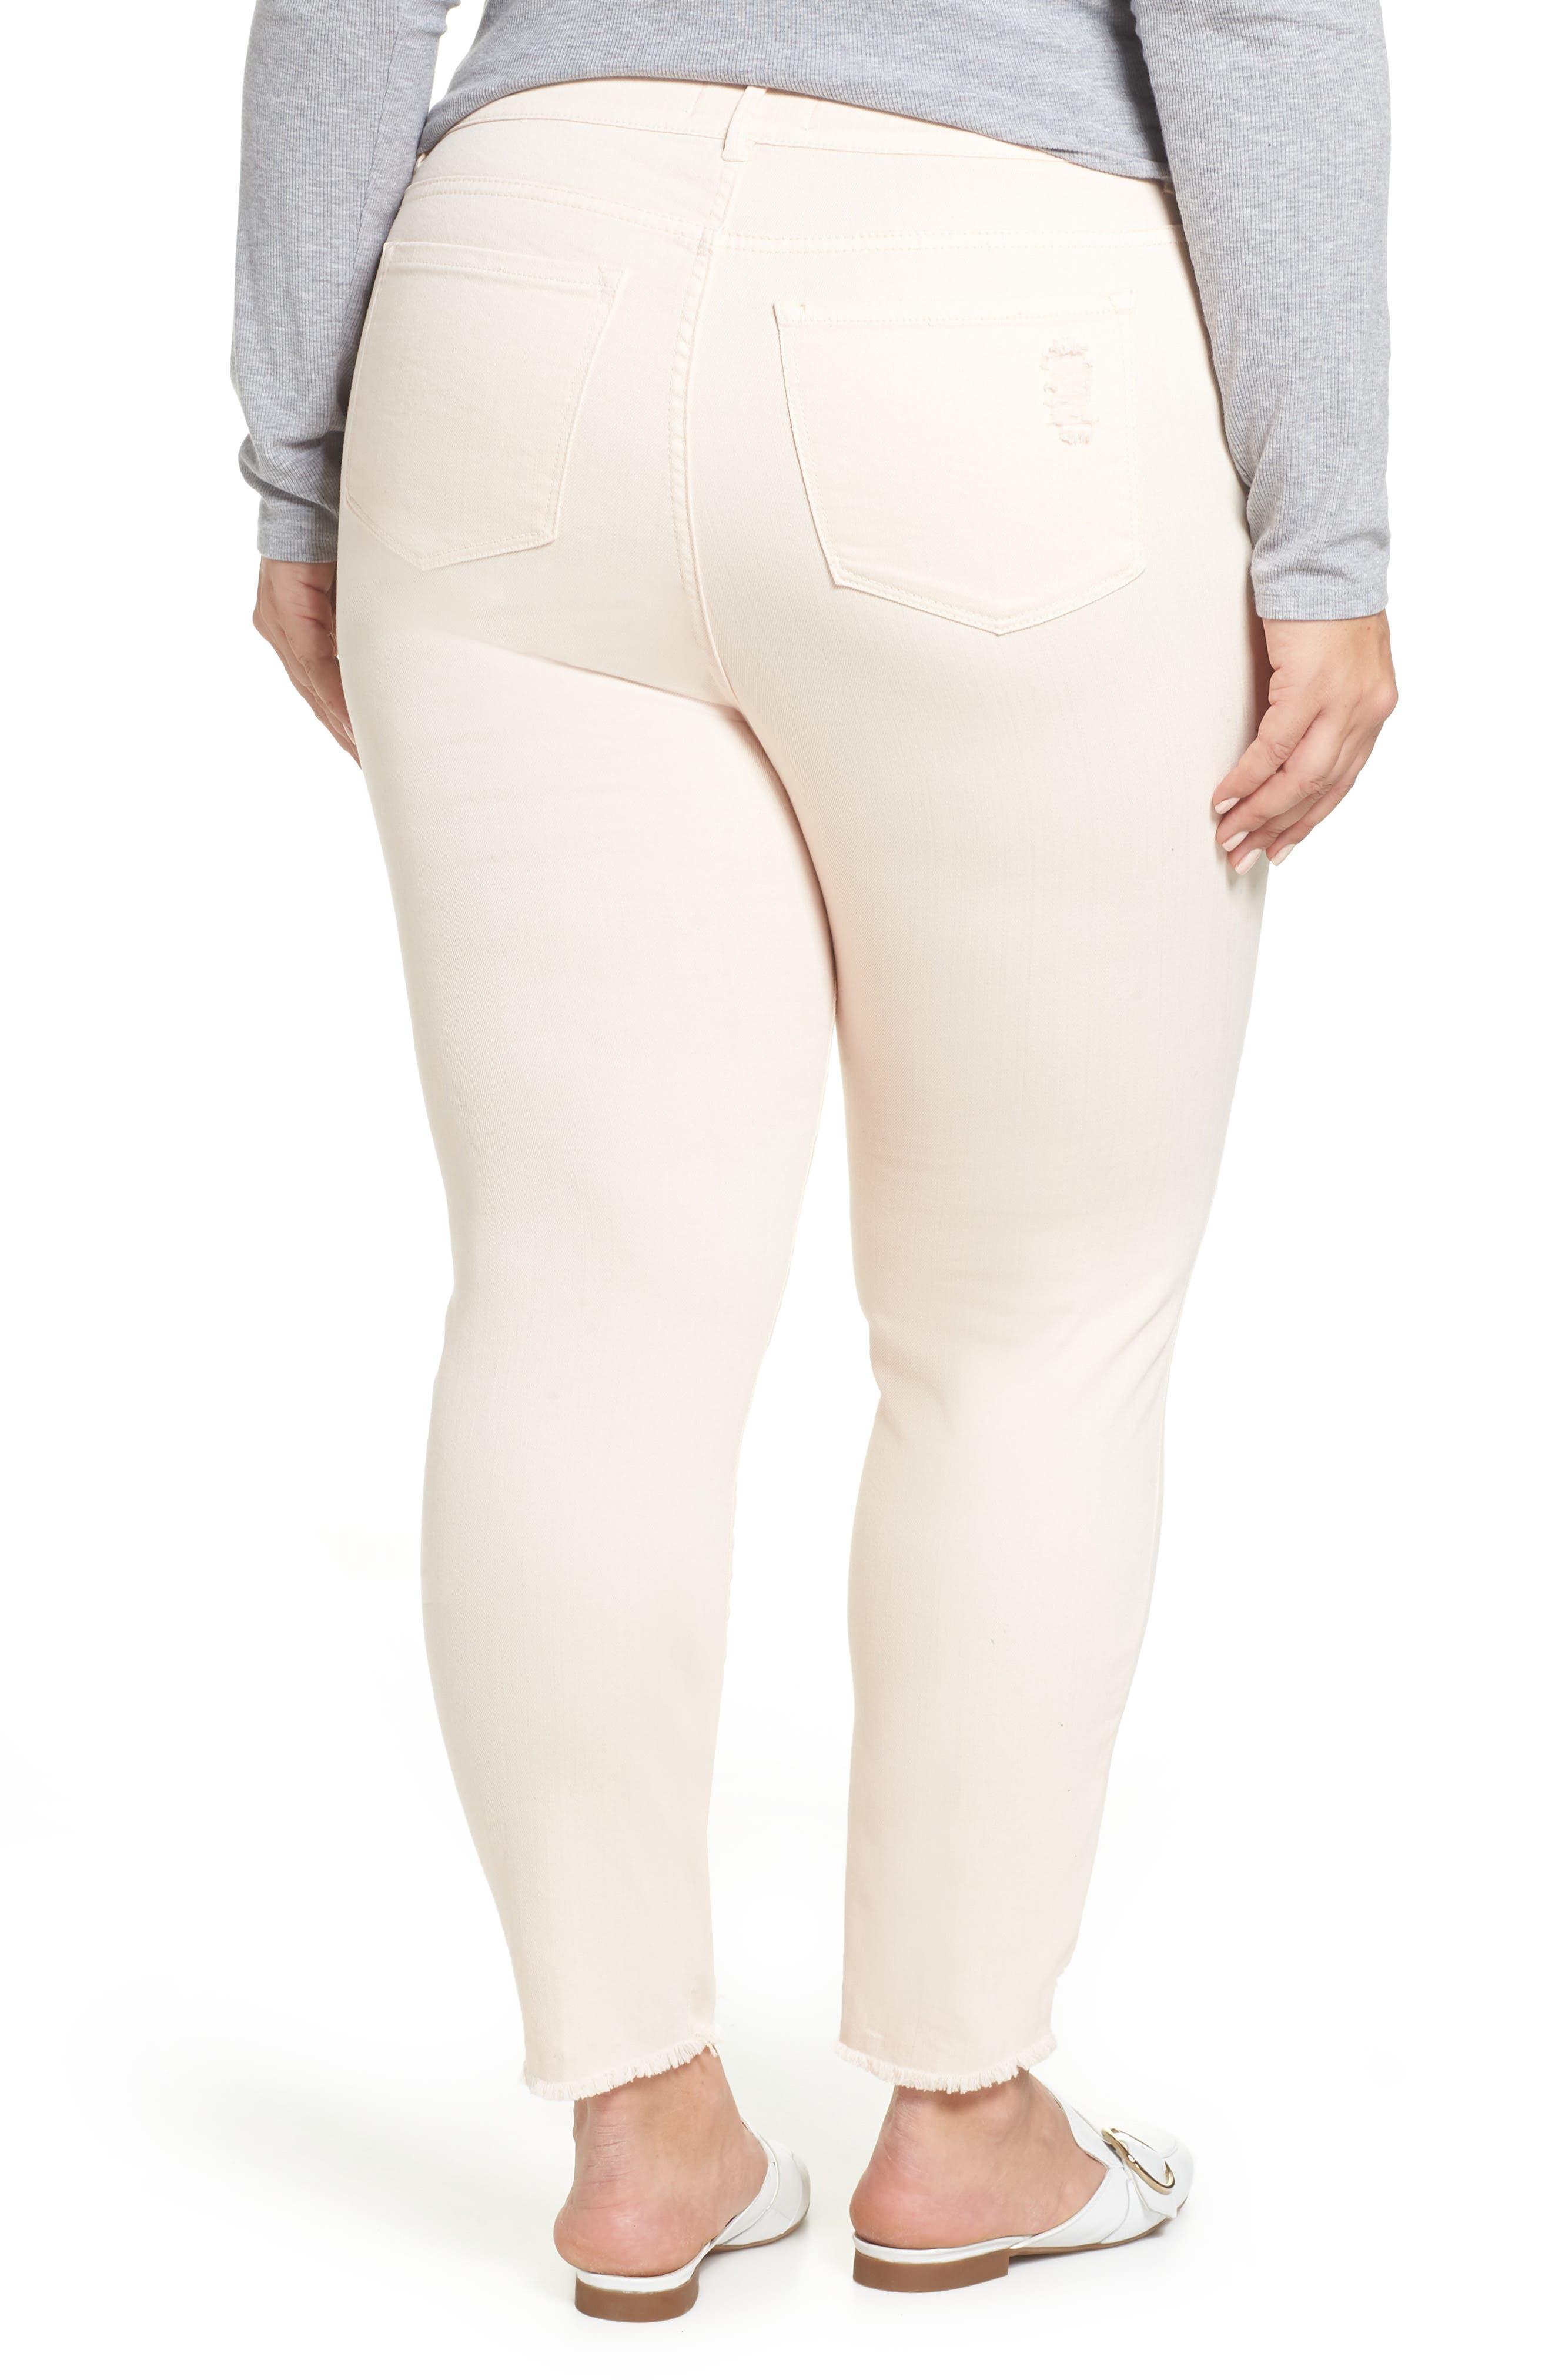 RACHEL RACHEL ROY, Icon Distressed Skinny Jeans, Alternate thumbnail 2, color, 680